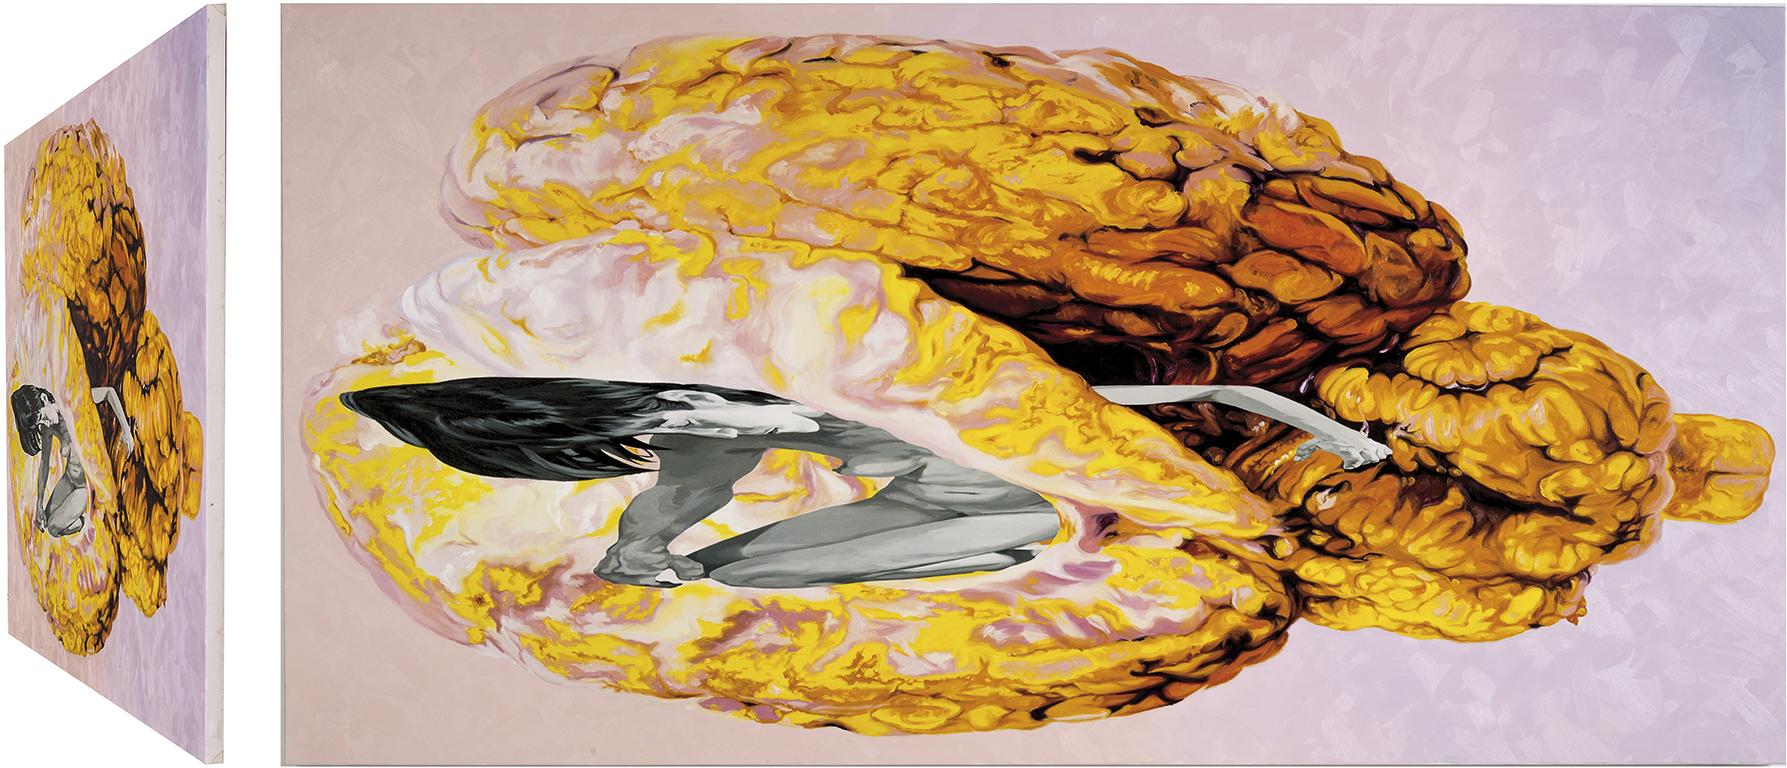 Gálata Ludovisi. Óleo sobre lienzo. 73 x 146 cm